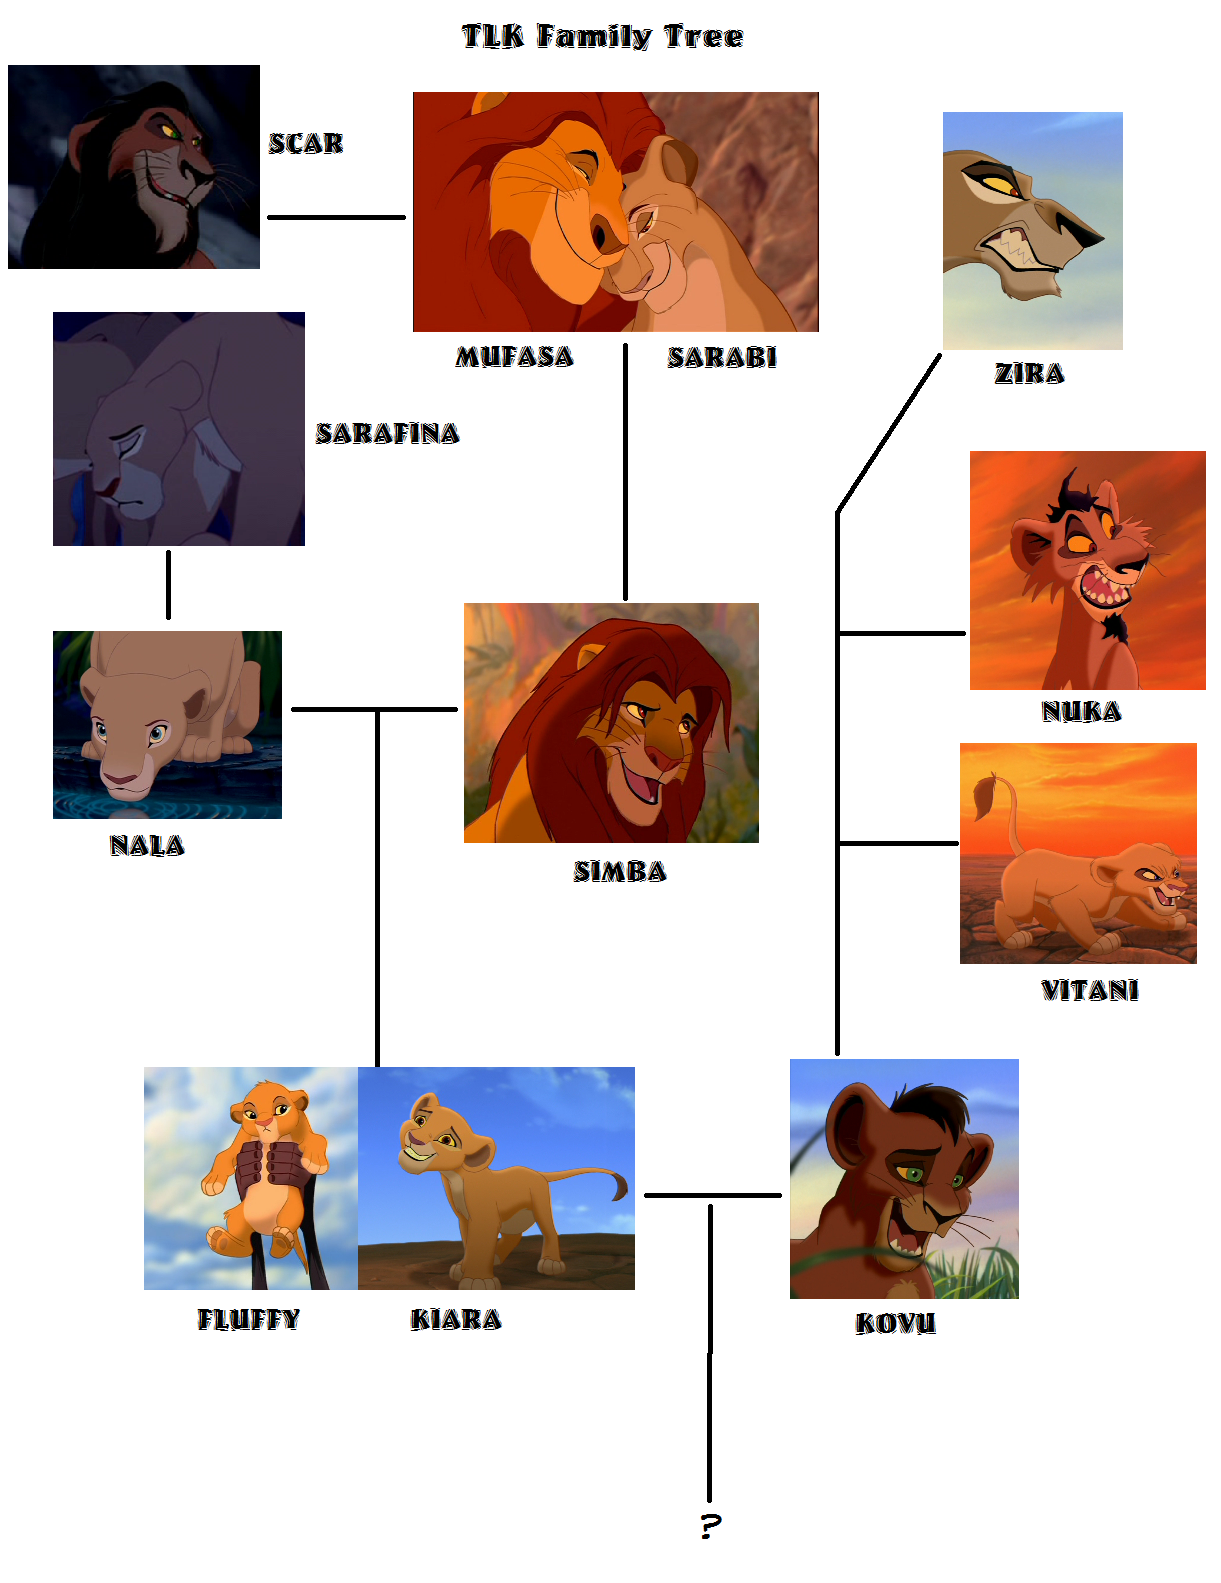 TLK Family albero